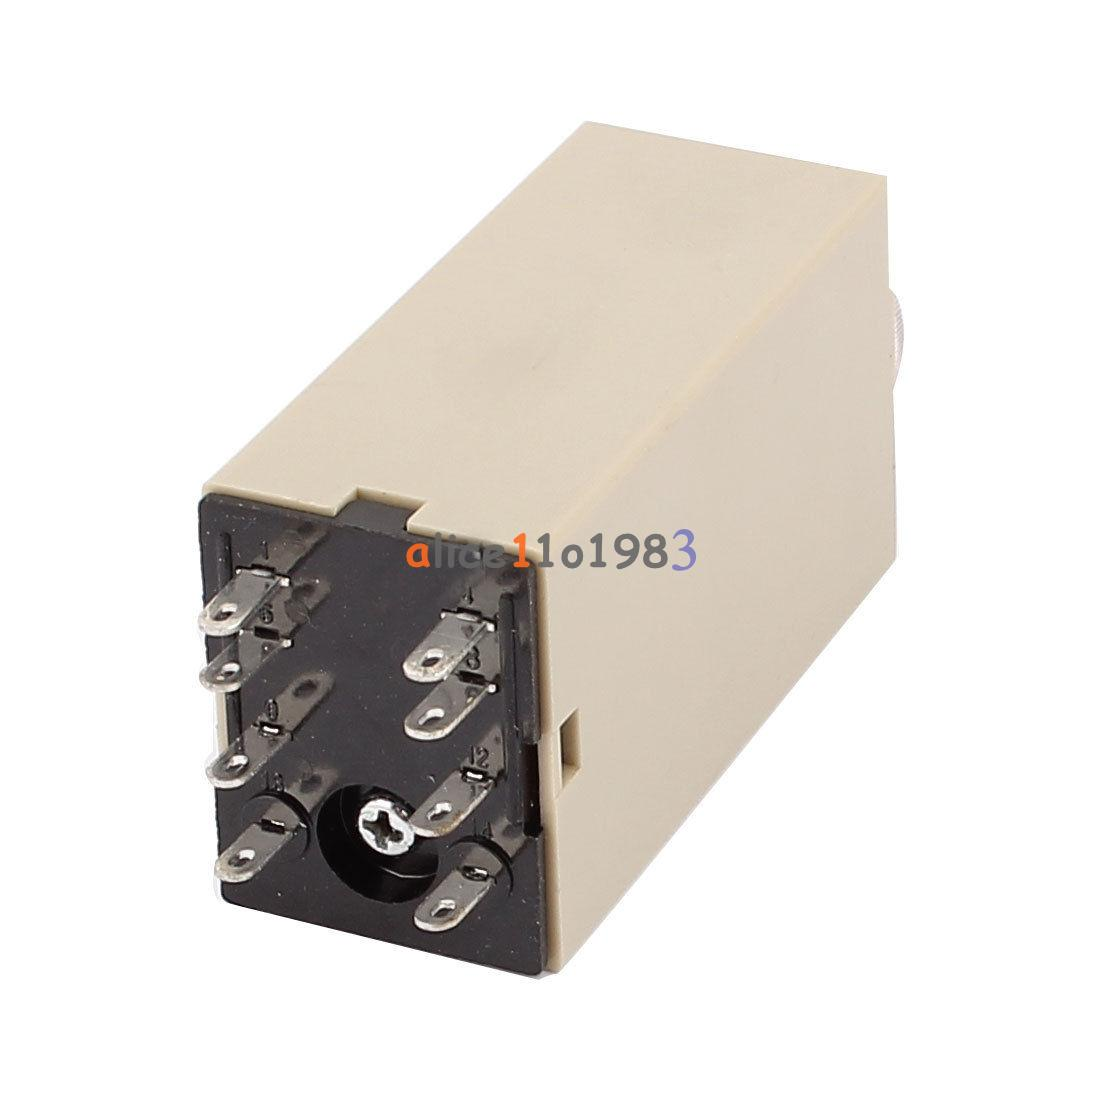 870567613  Pin Time Delay Relay Wiring on 8 pin transformer, 12 volt timer relay, delay timer relay, 8 pin terminal block, 8 pin timers digital, 8 pin battery, 8 pin fan, 12 pin time delay relay, 8 pin switch, 8 pin plug, 11 pin time delay relay,